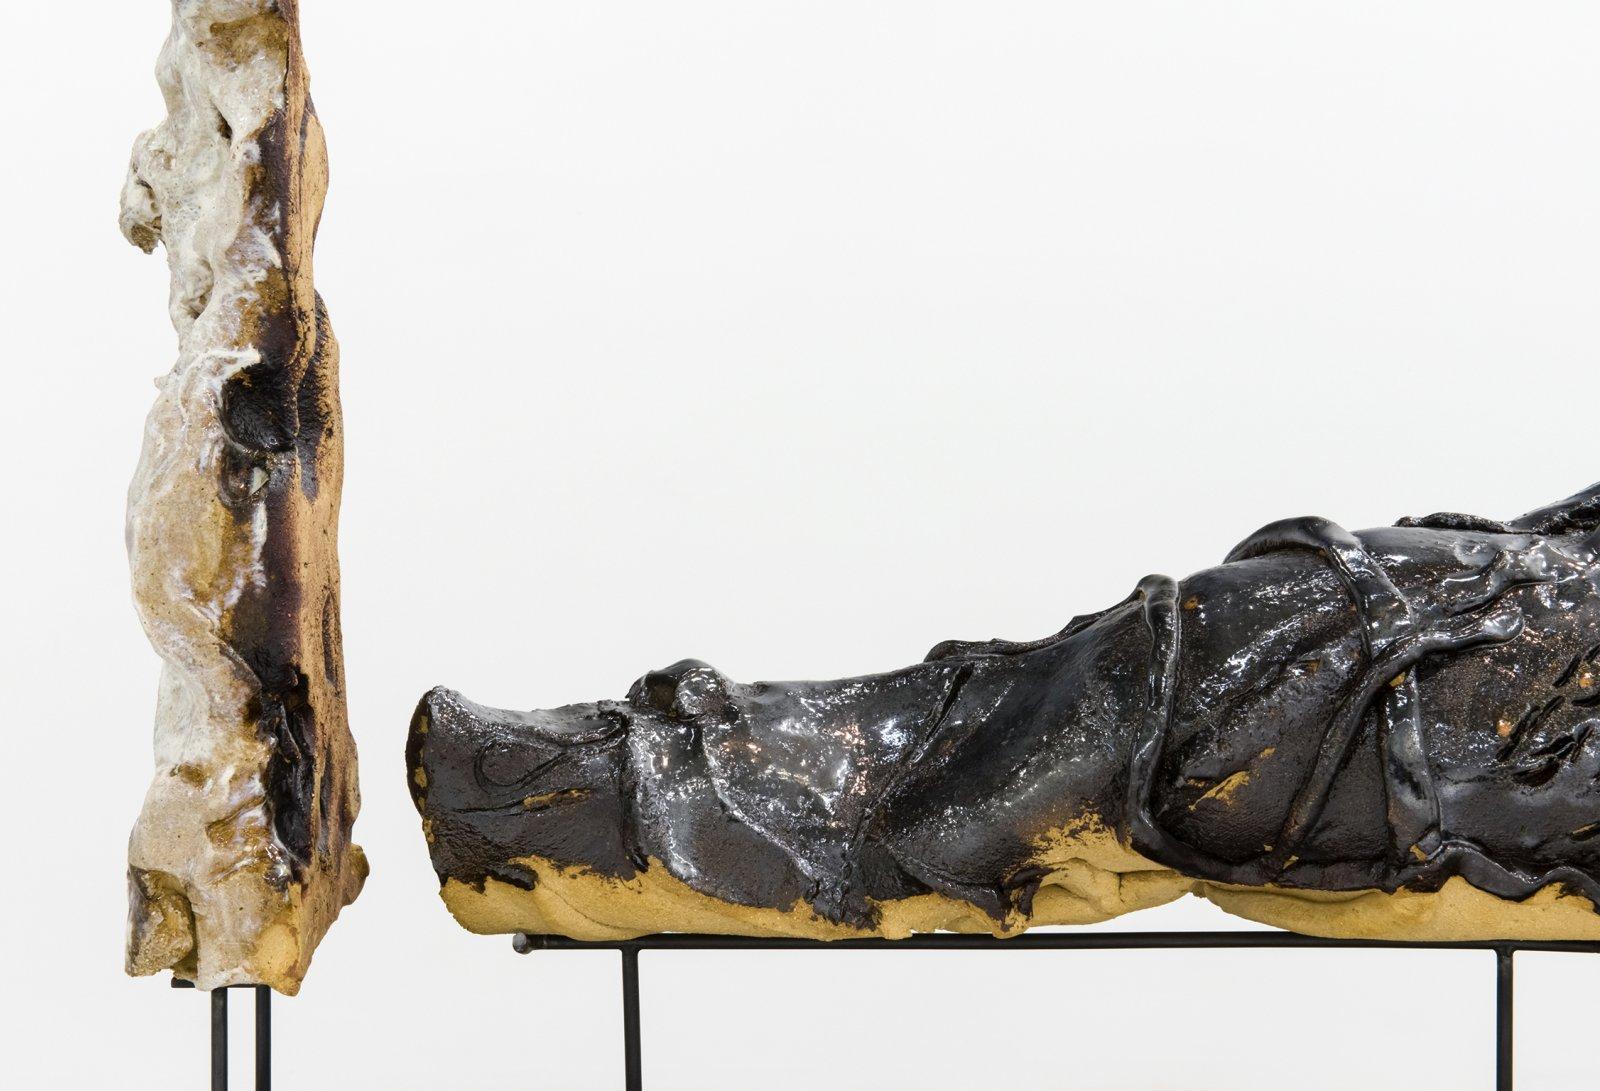 Damian Moppett, Figure with Shadow (detail), 2016, glazed stoneware, wood, steel, 23 x 11 x 21 in. (57 x 27 x 53 cm) by Damian Moppett